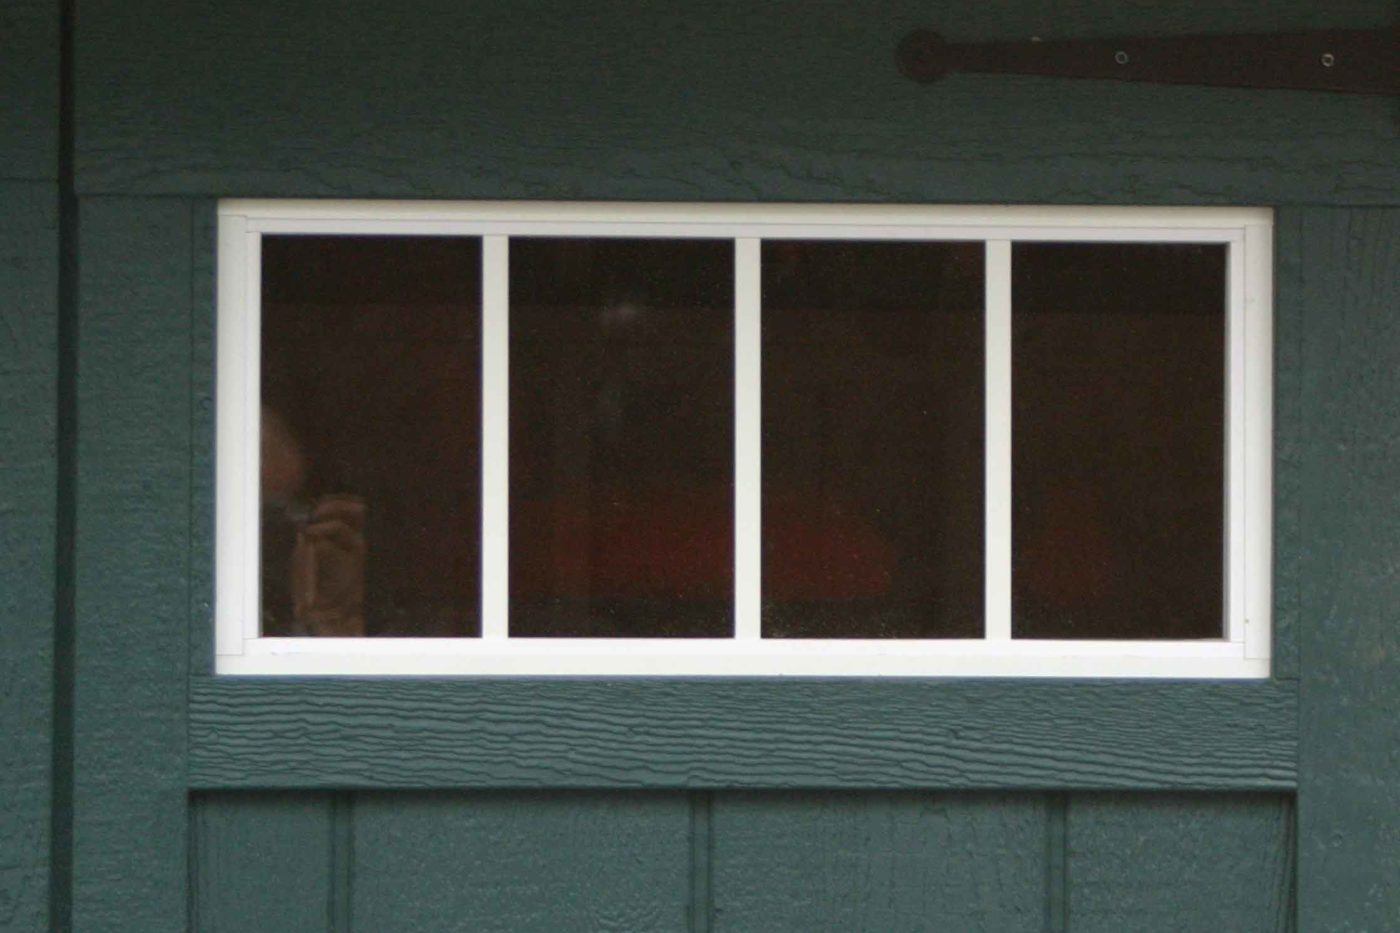 4 pane window on amish built garage